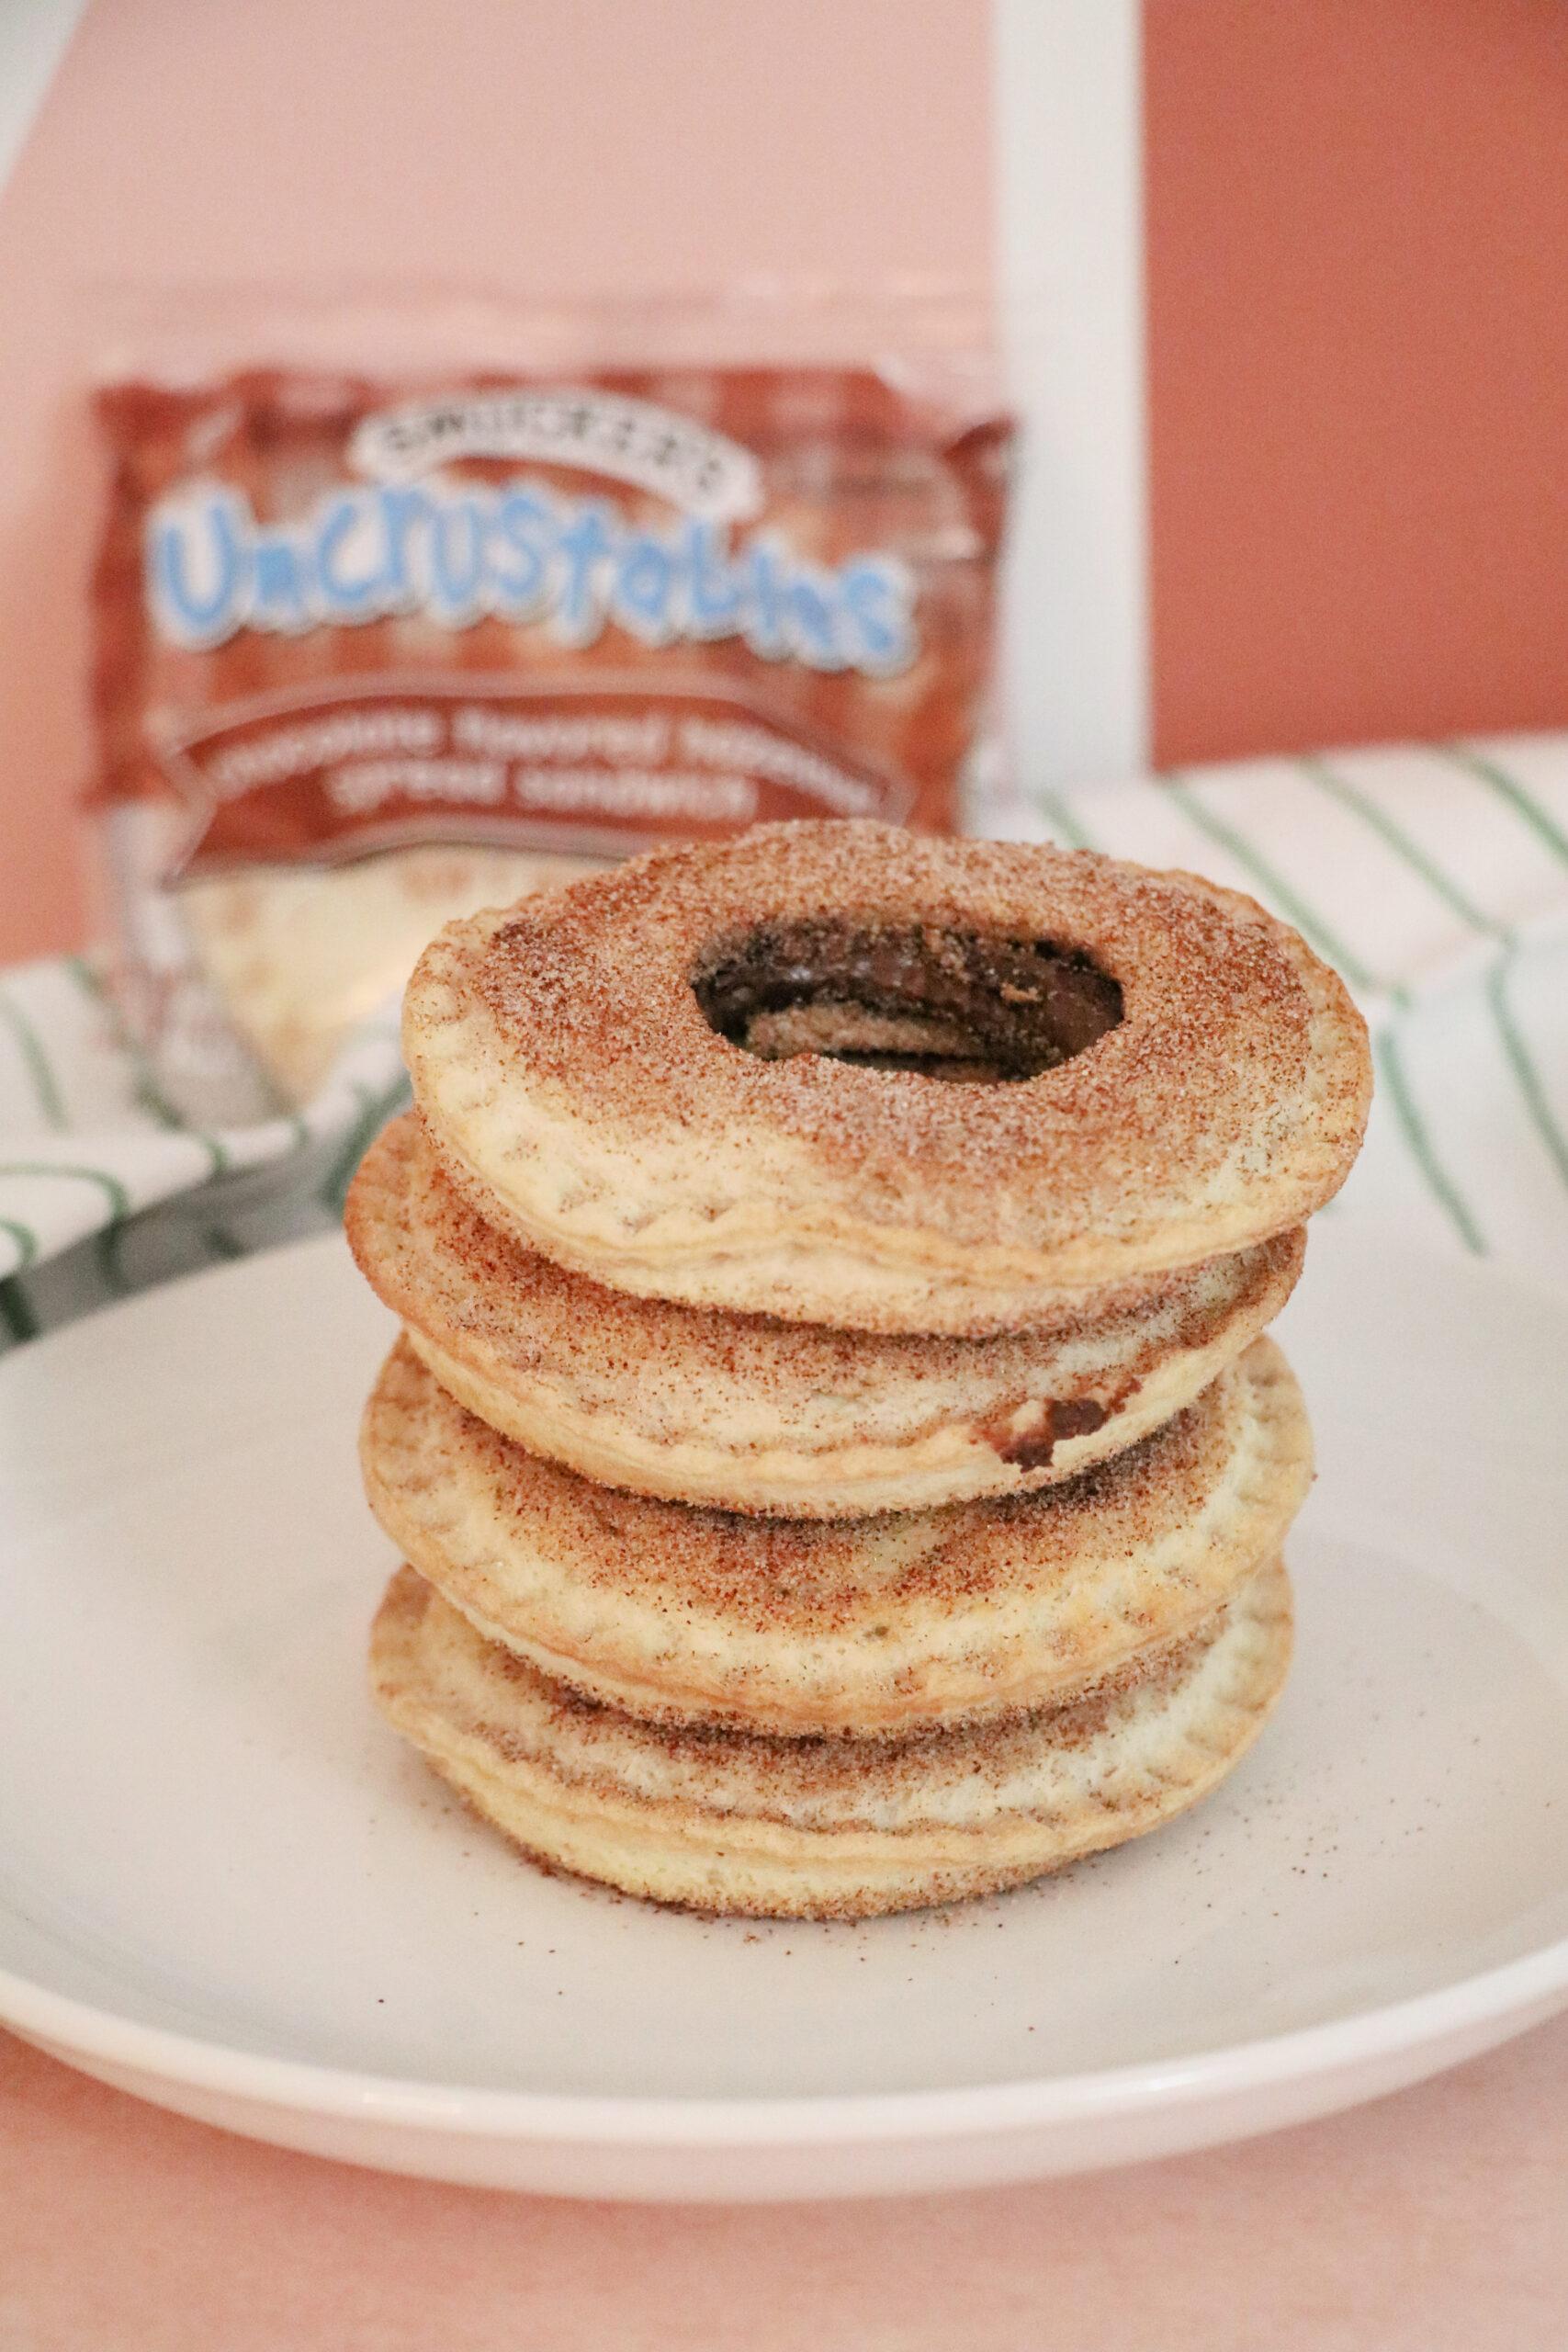 nutella uncrustable air fryer donut